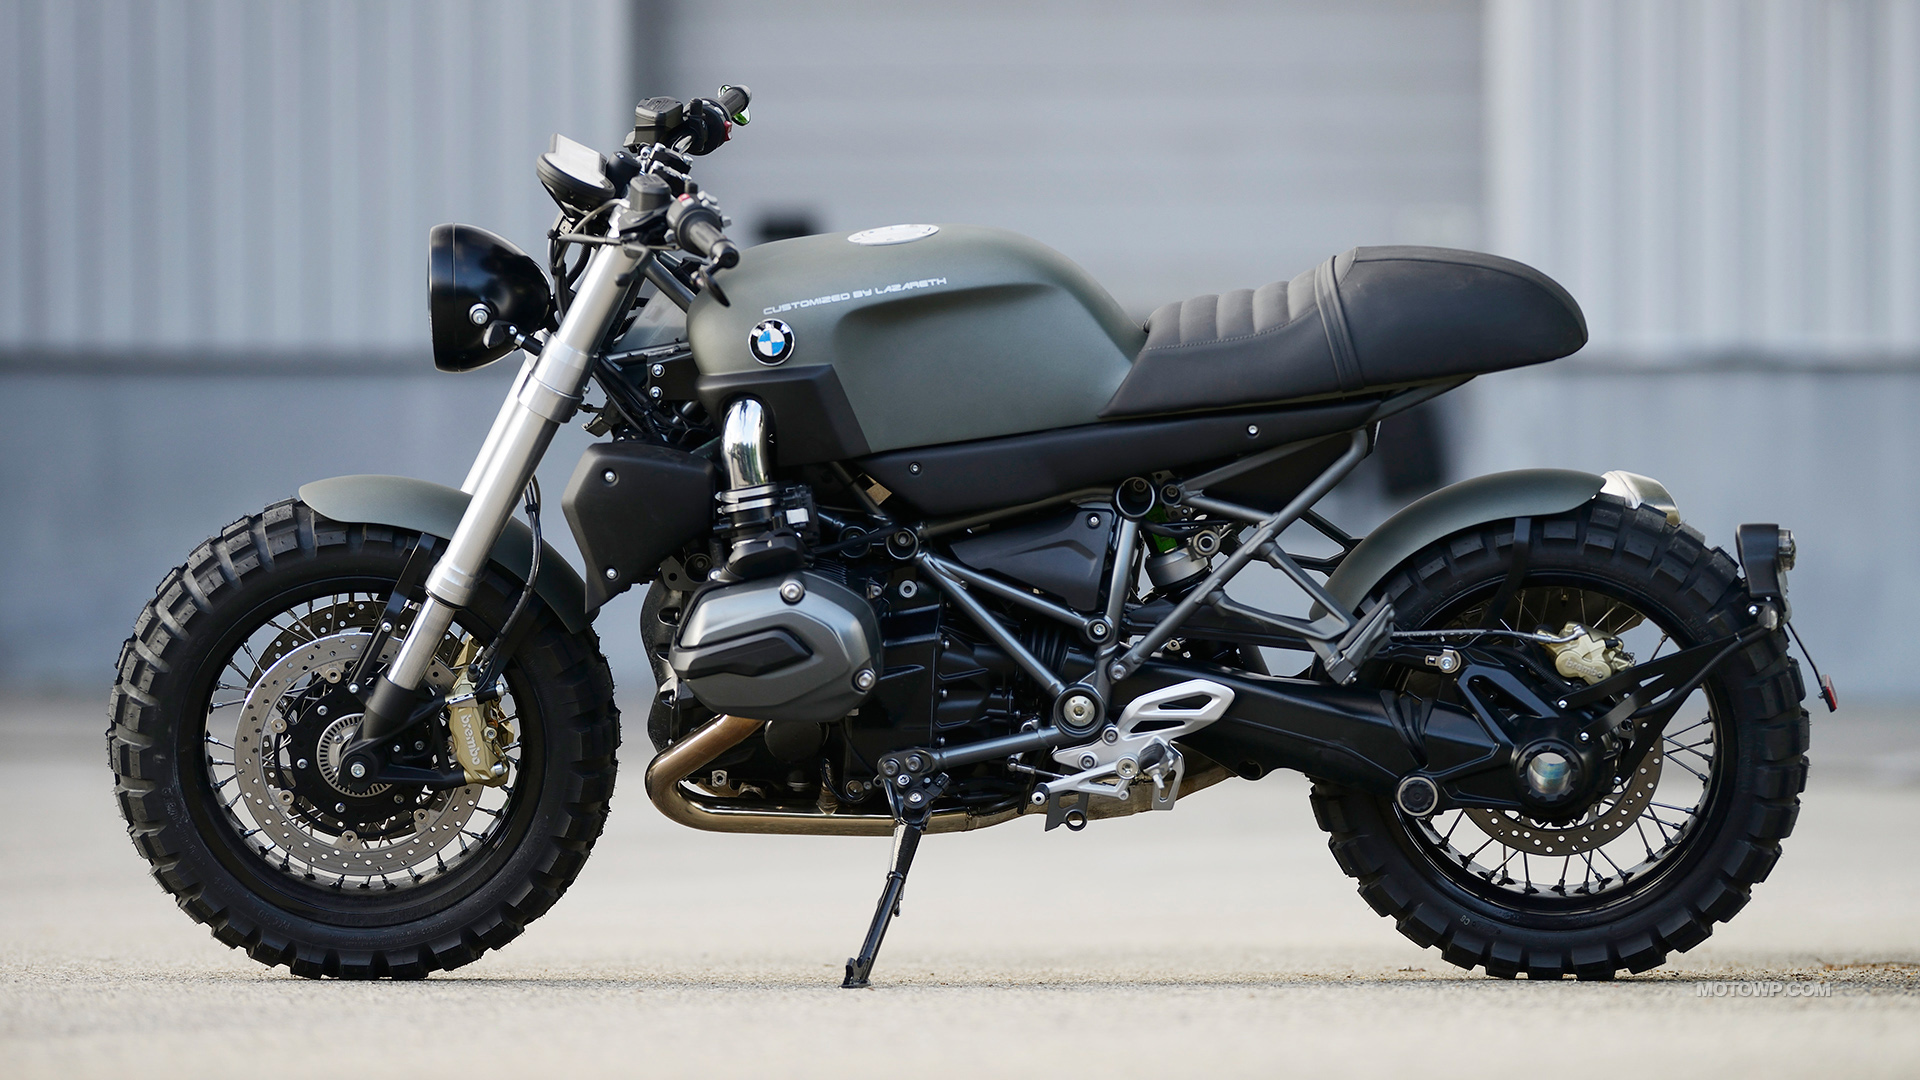 Custom Motorcycle Desktop Wallpapers Lazareth Bmw R1200r